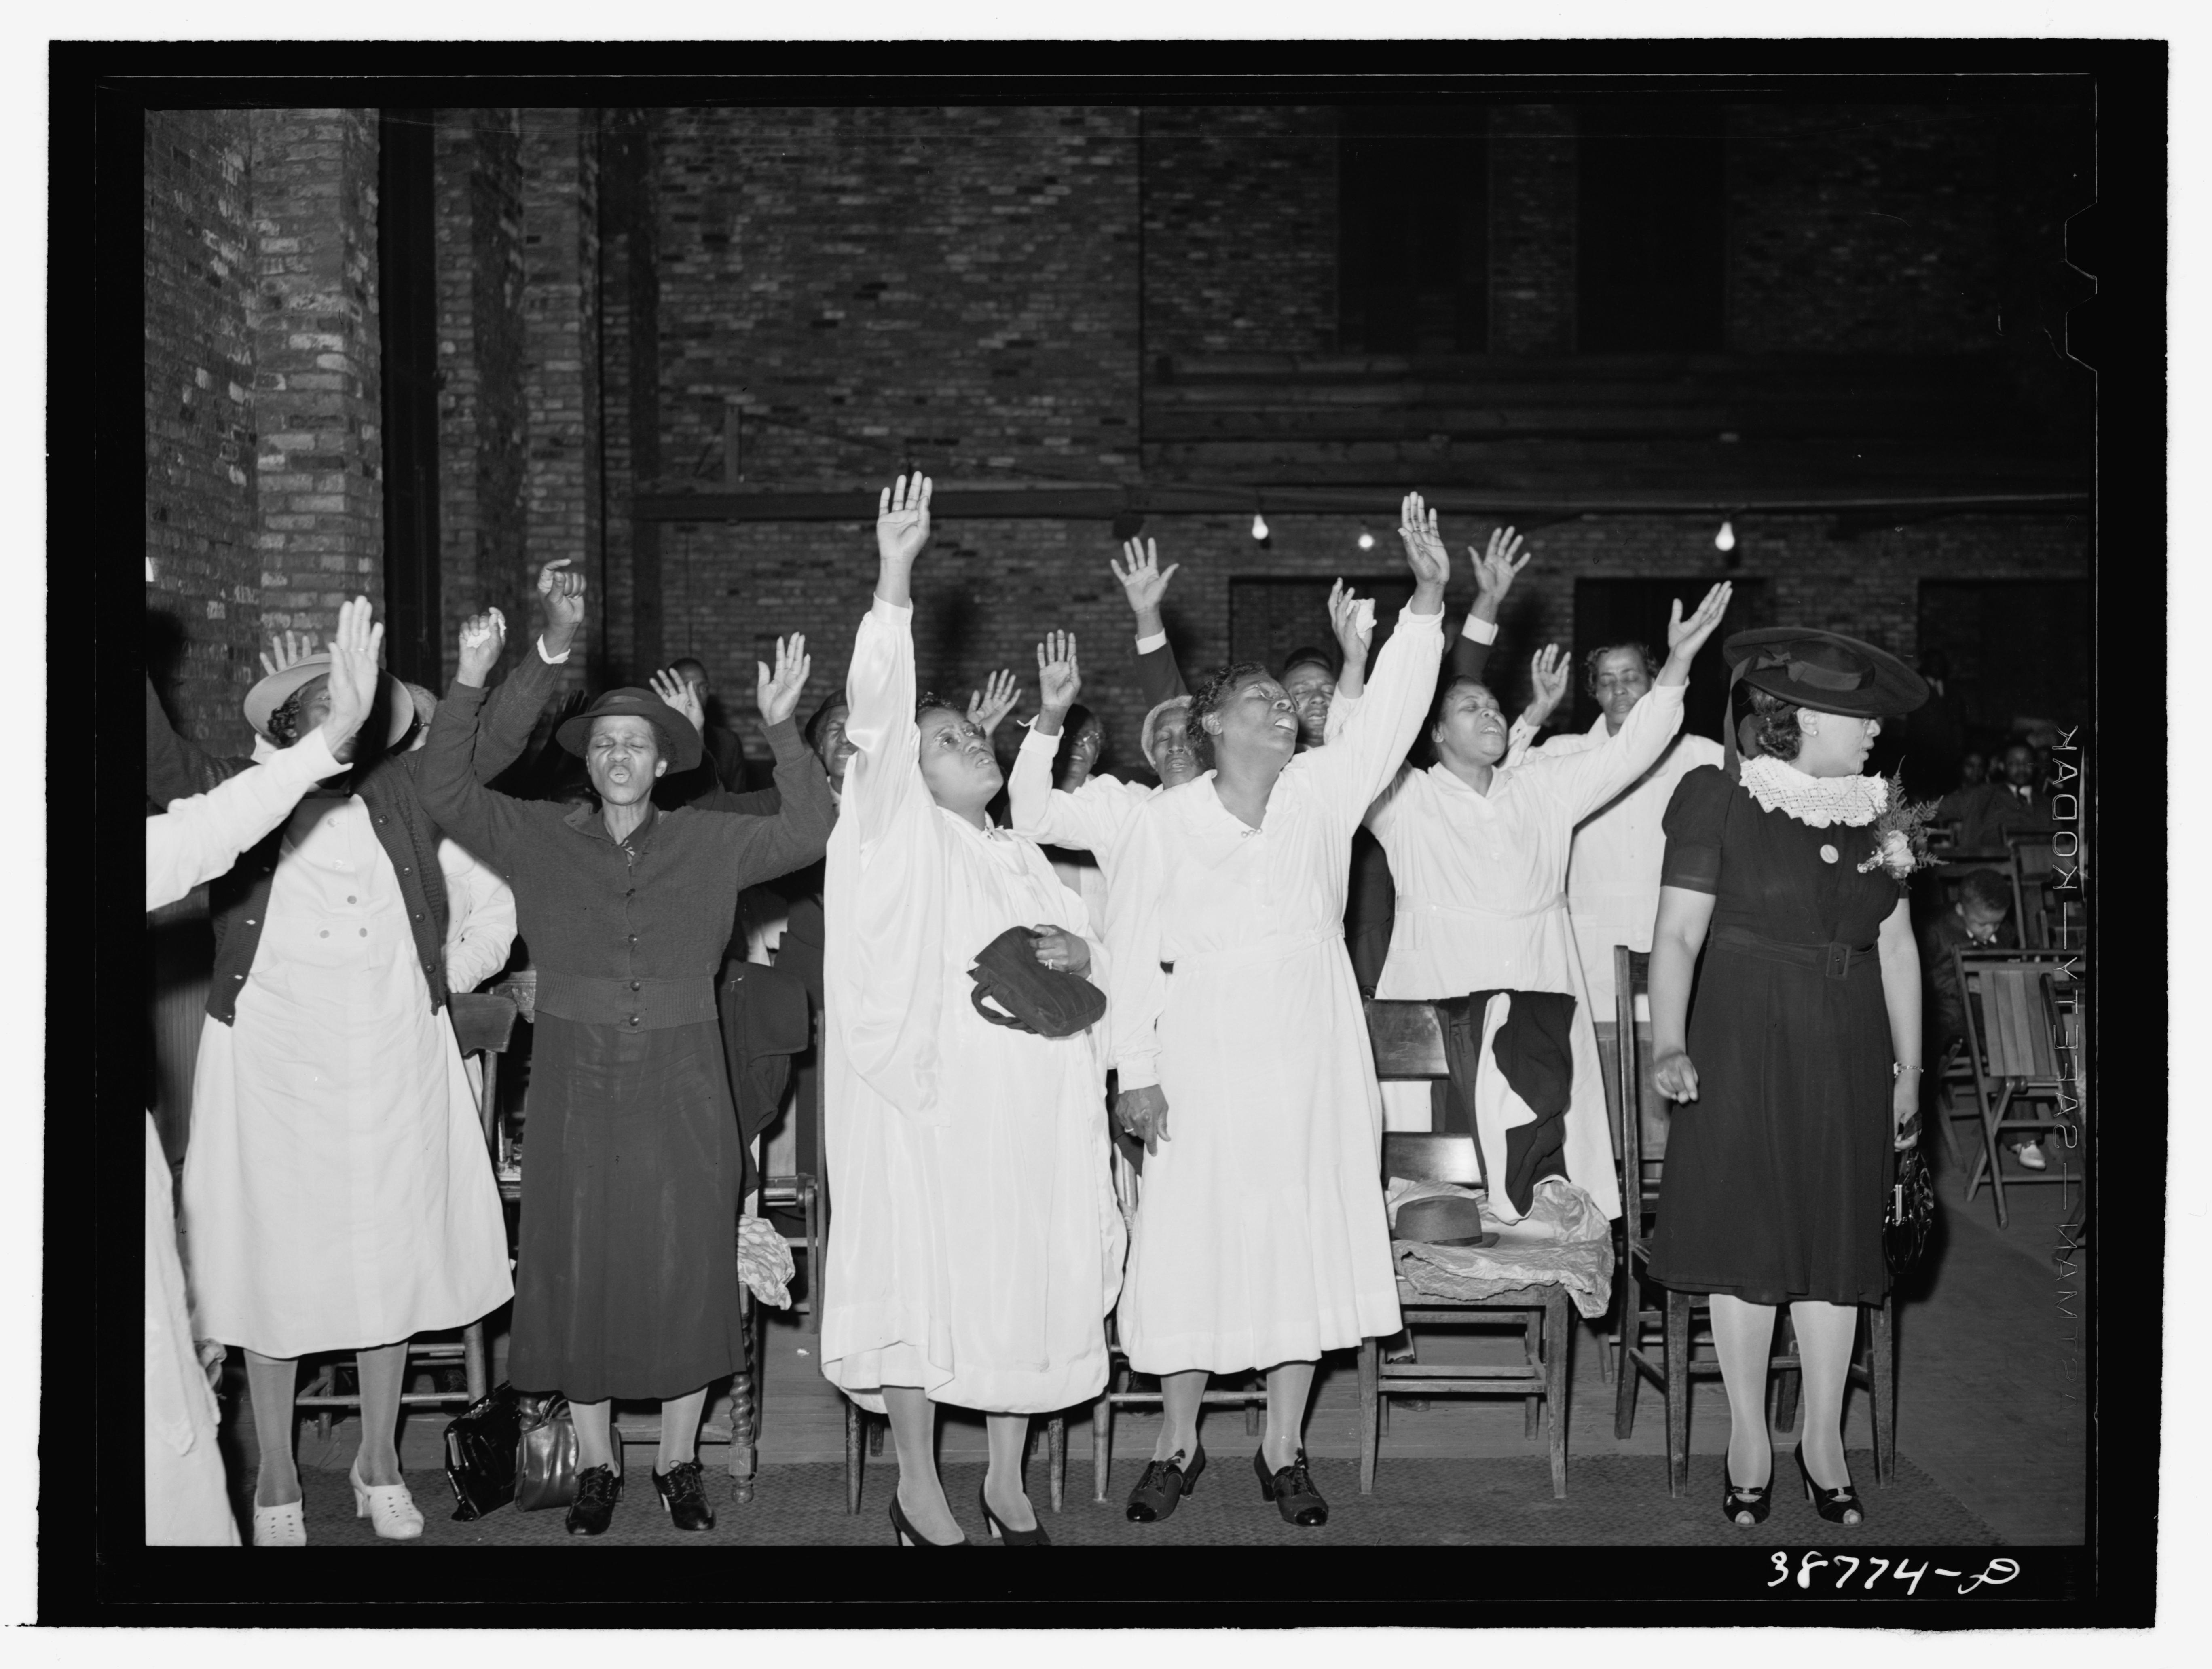 File:Pentecostals Praising.jpg